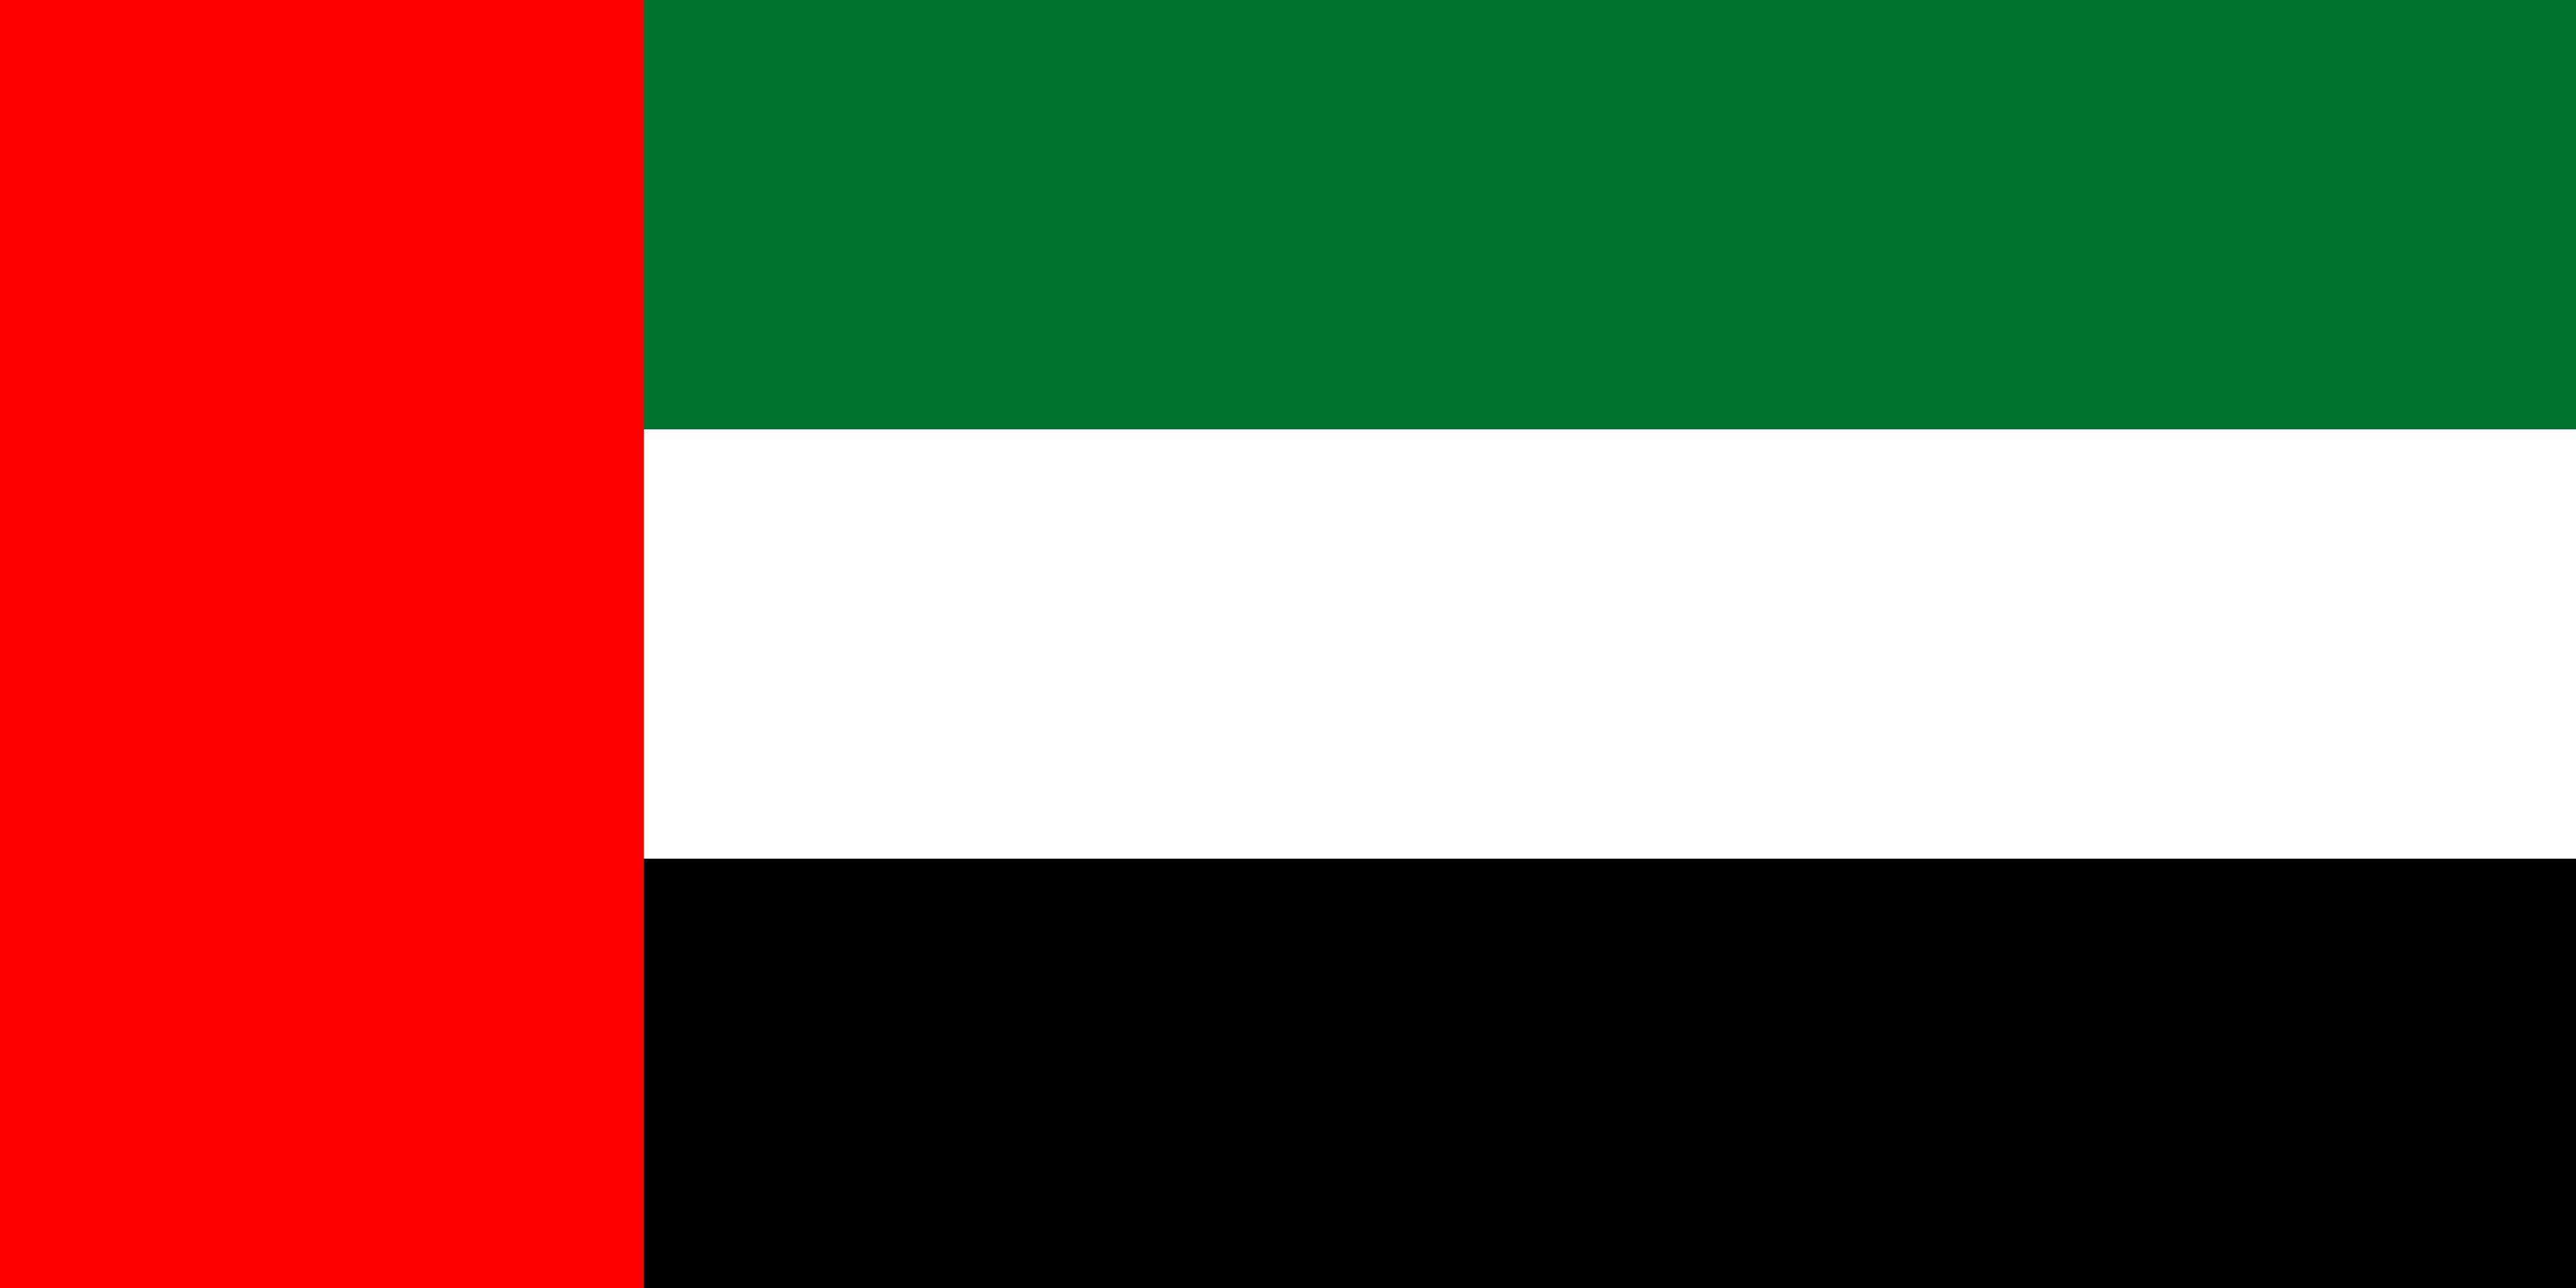 United_Arab_Emirates Flag Colours